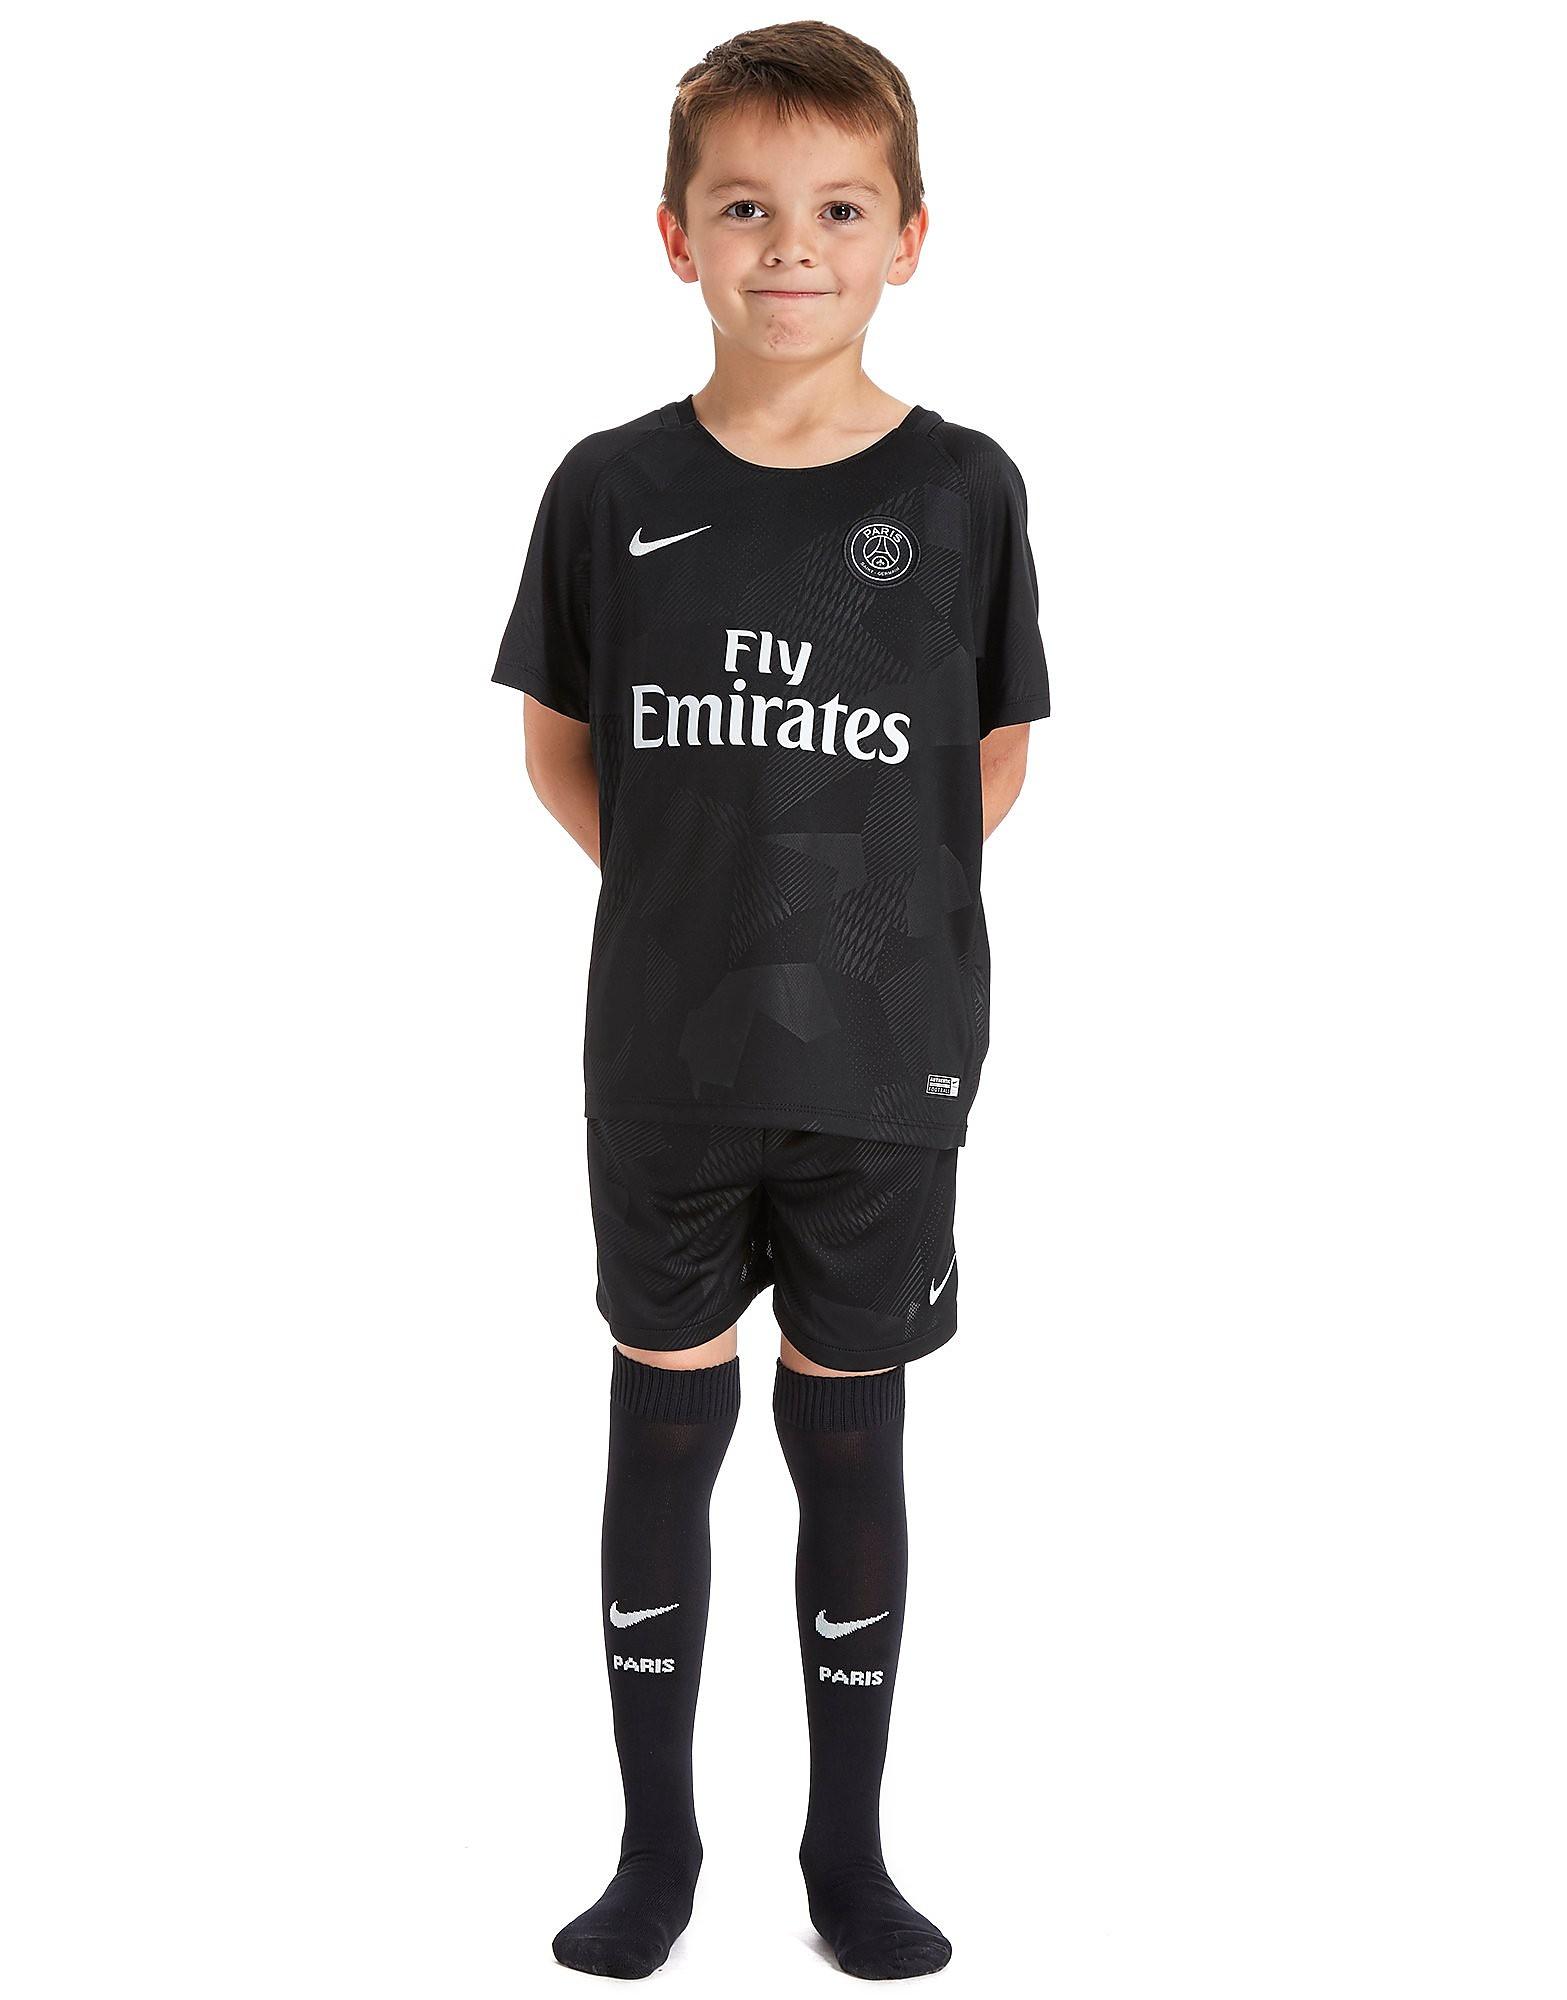 Nike Paris Saint Germain 2017/18 Third Kit Children